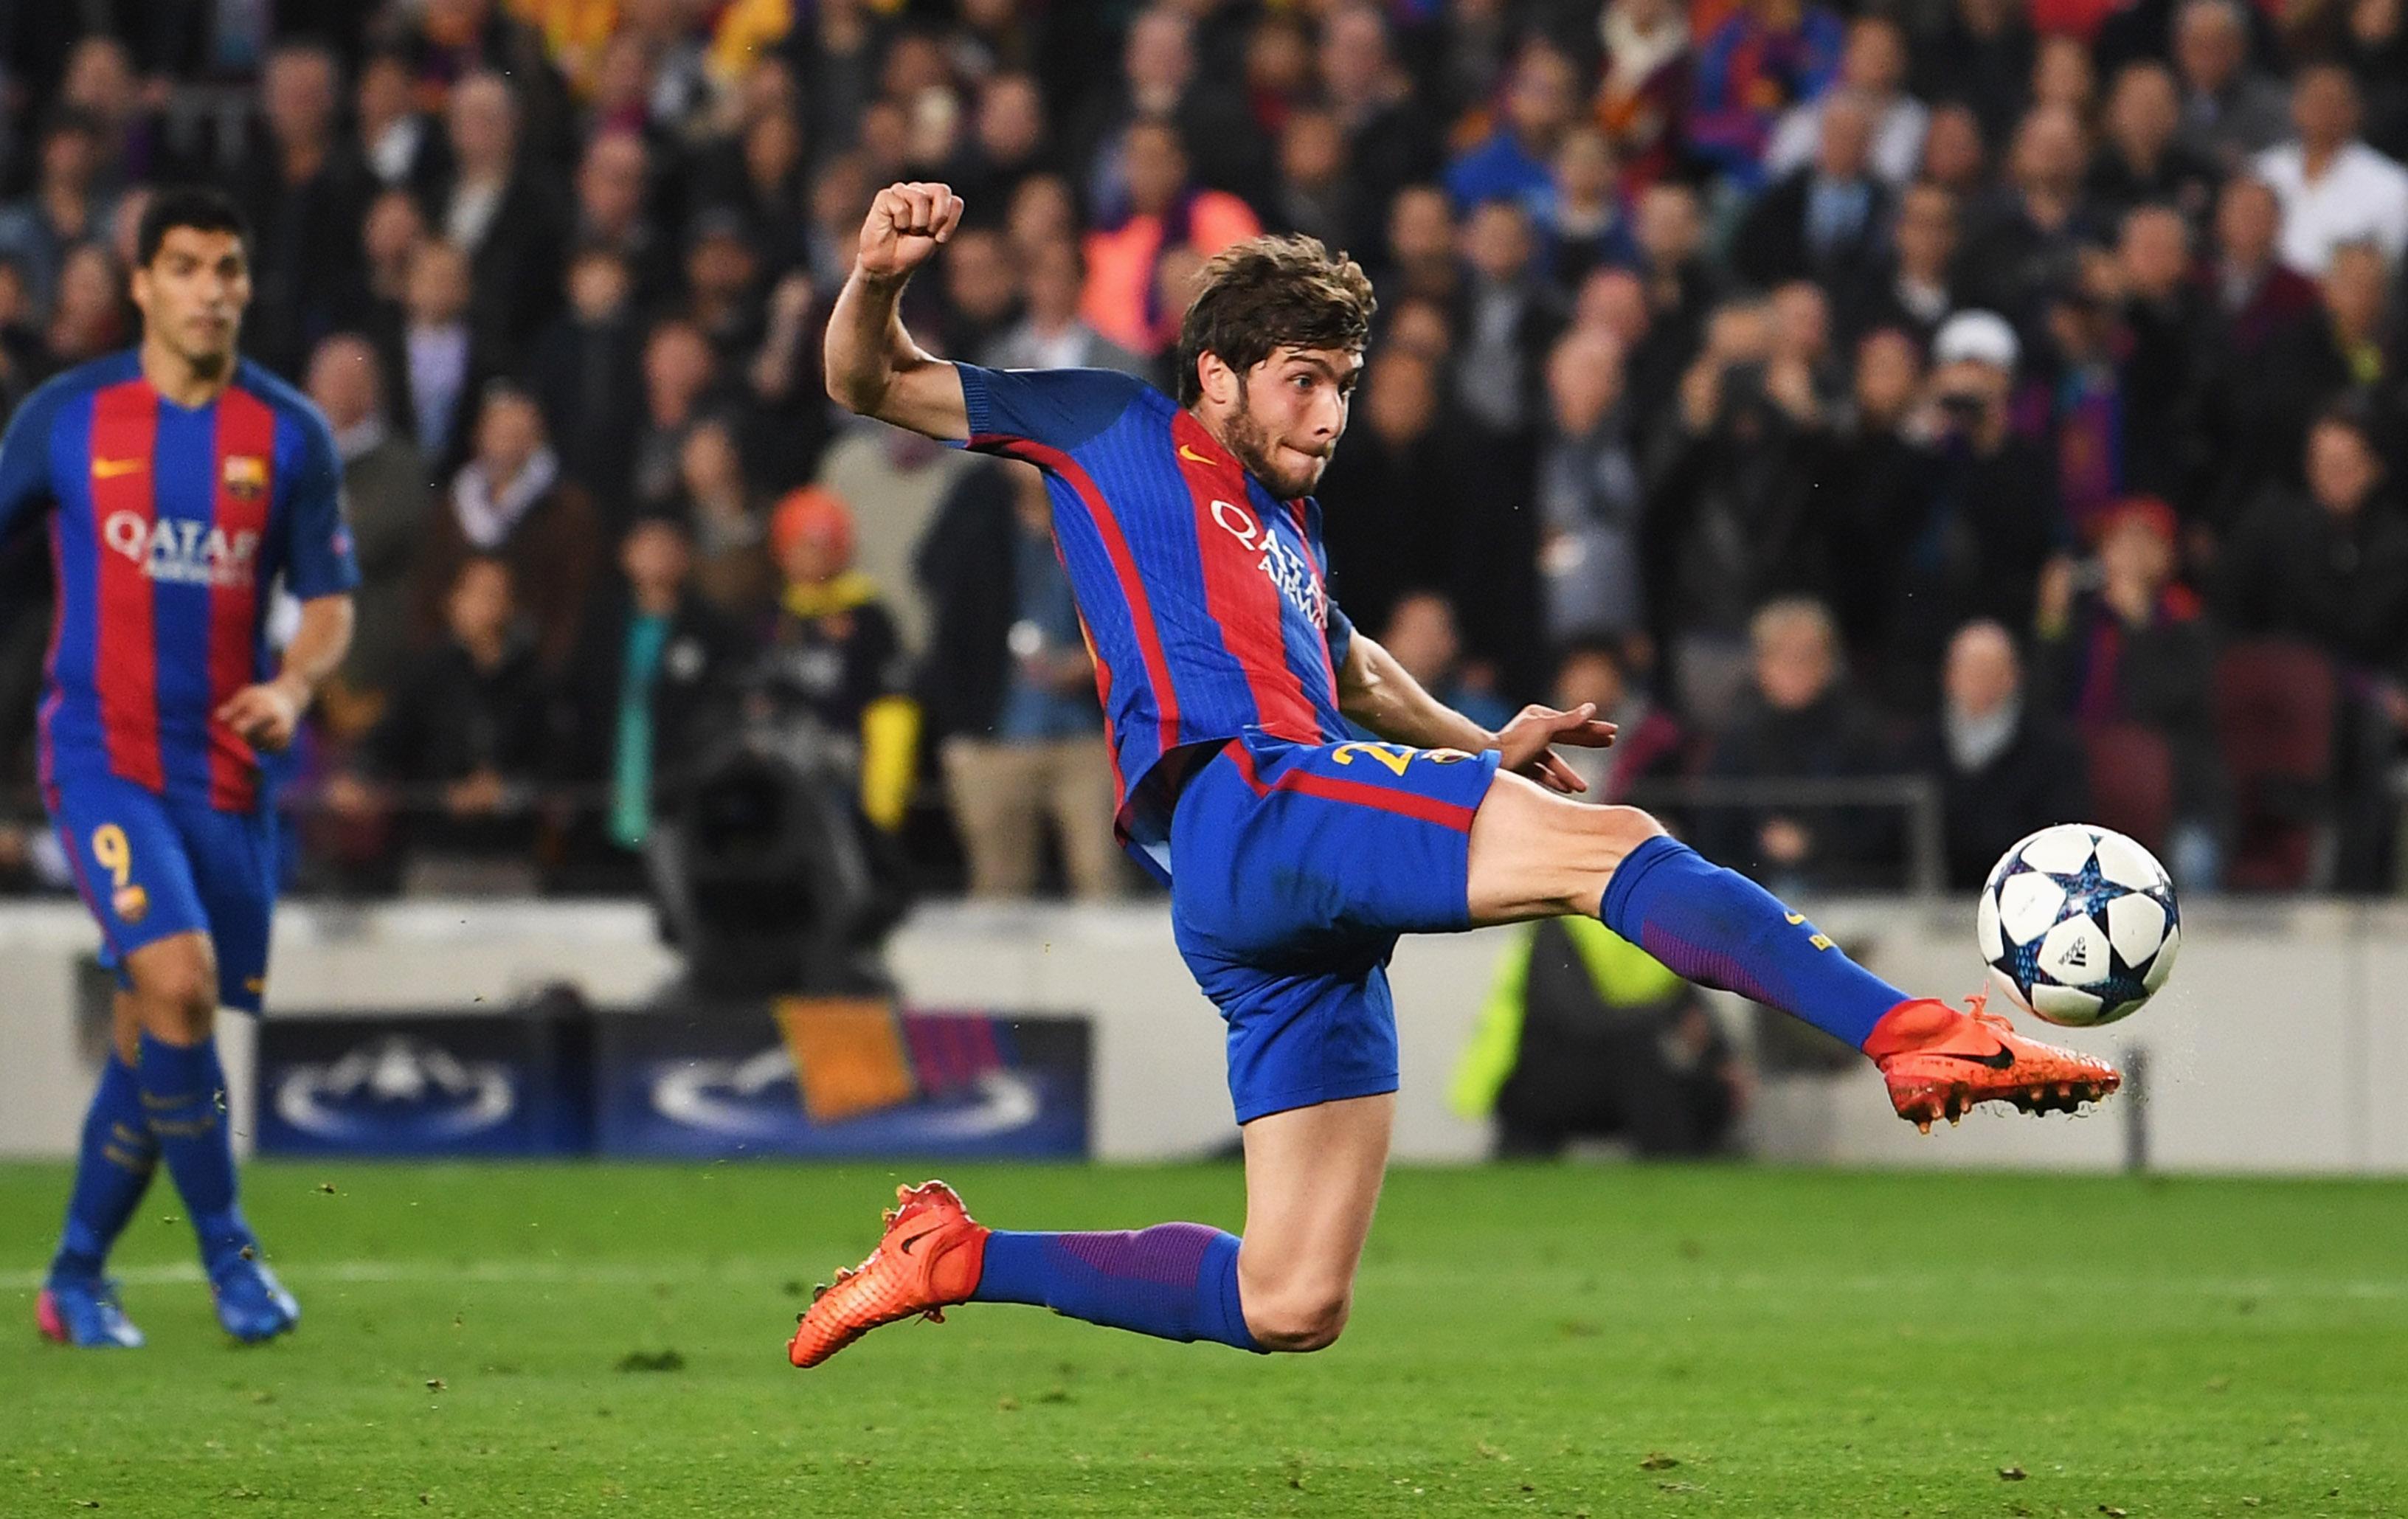 WATCH: Sergi Roberto Goal for Barcelona v PSG | Heavy.com